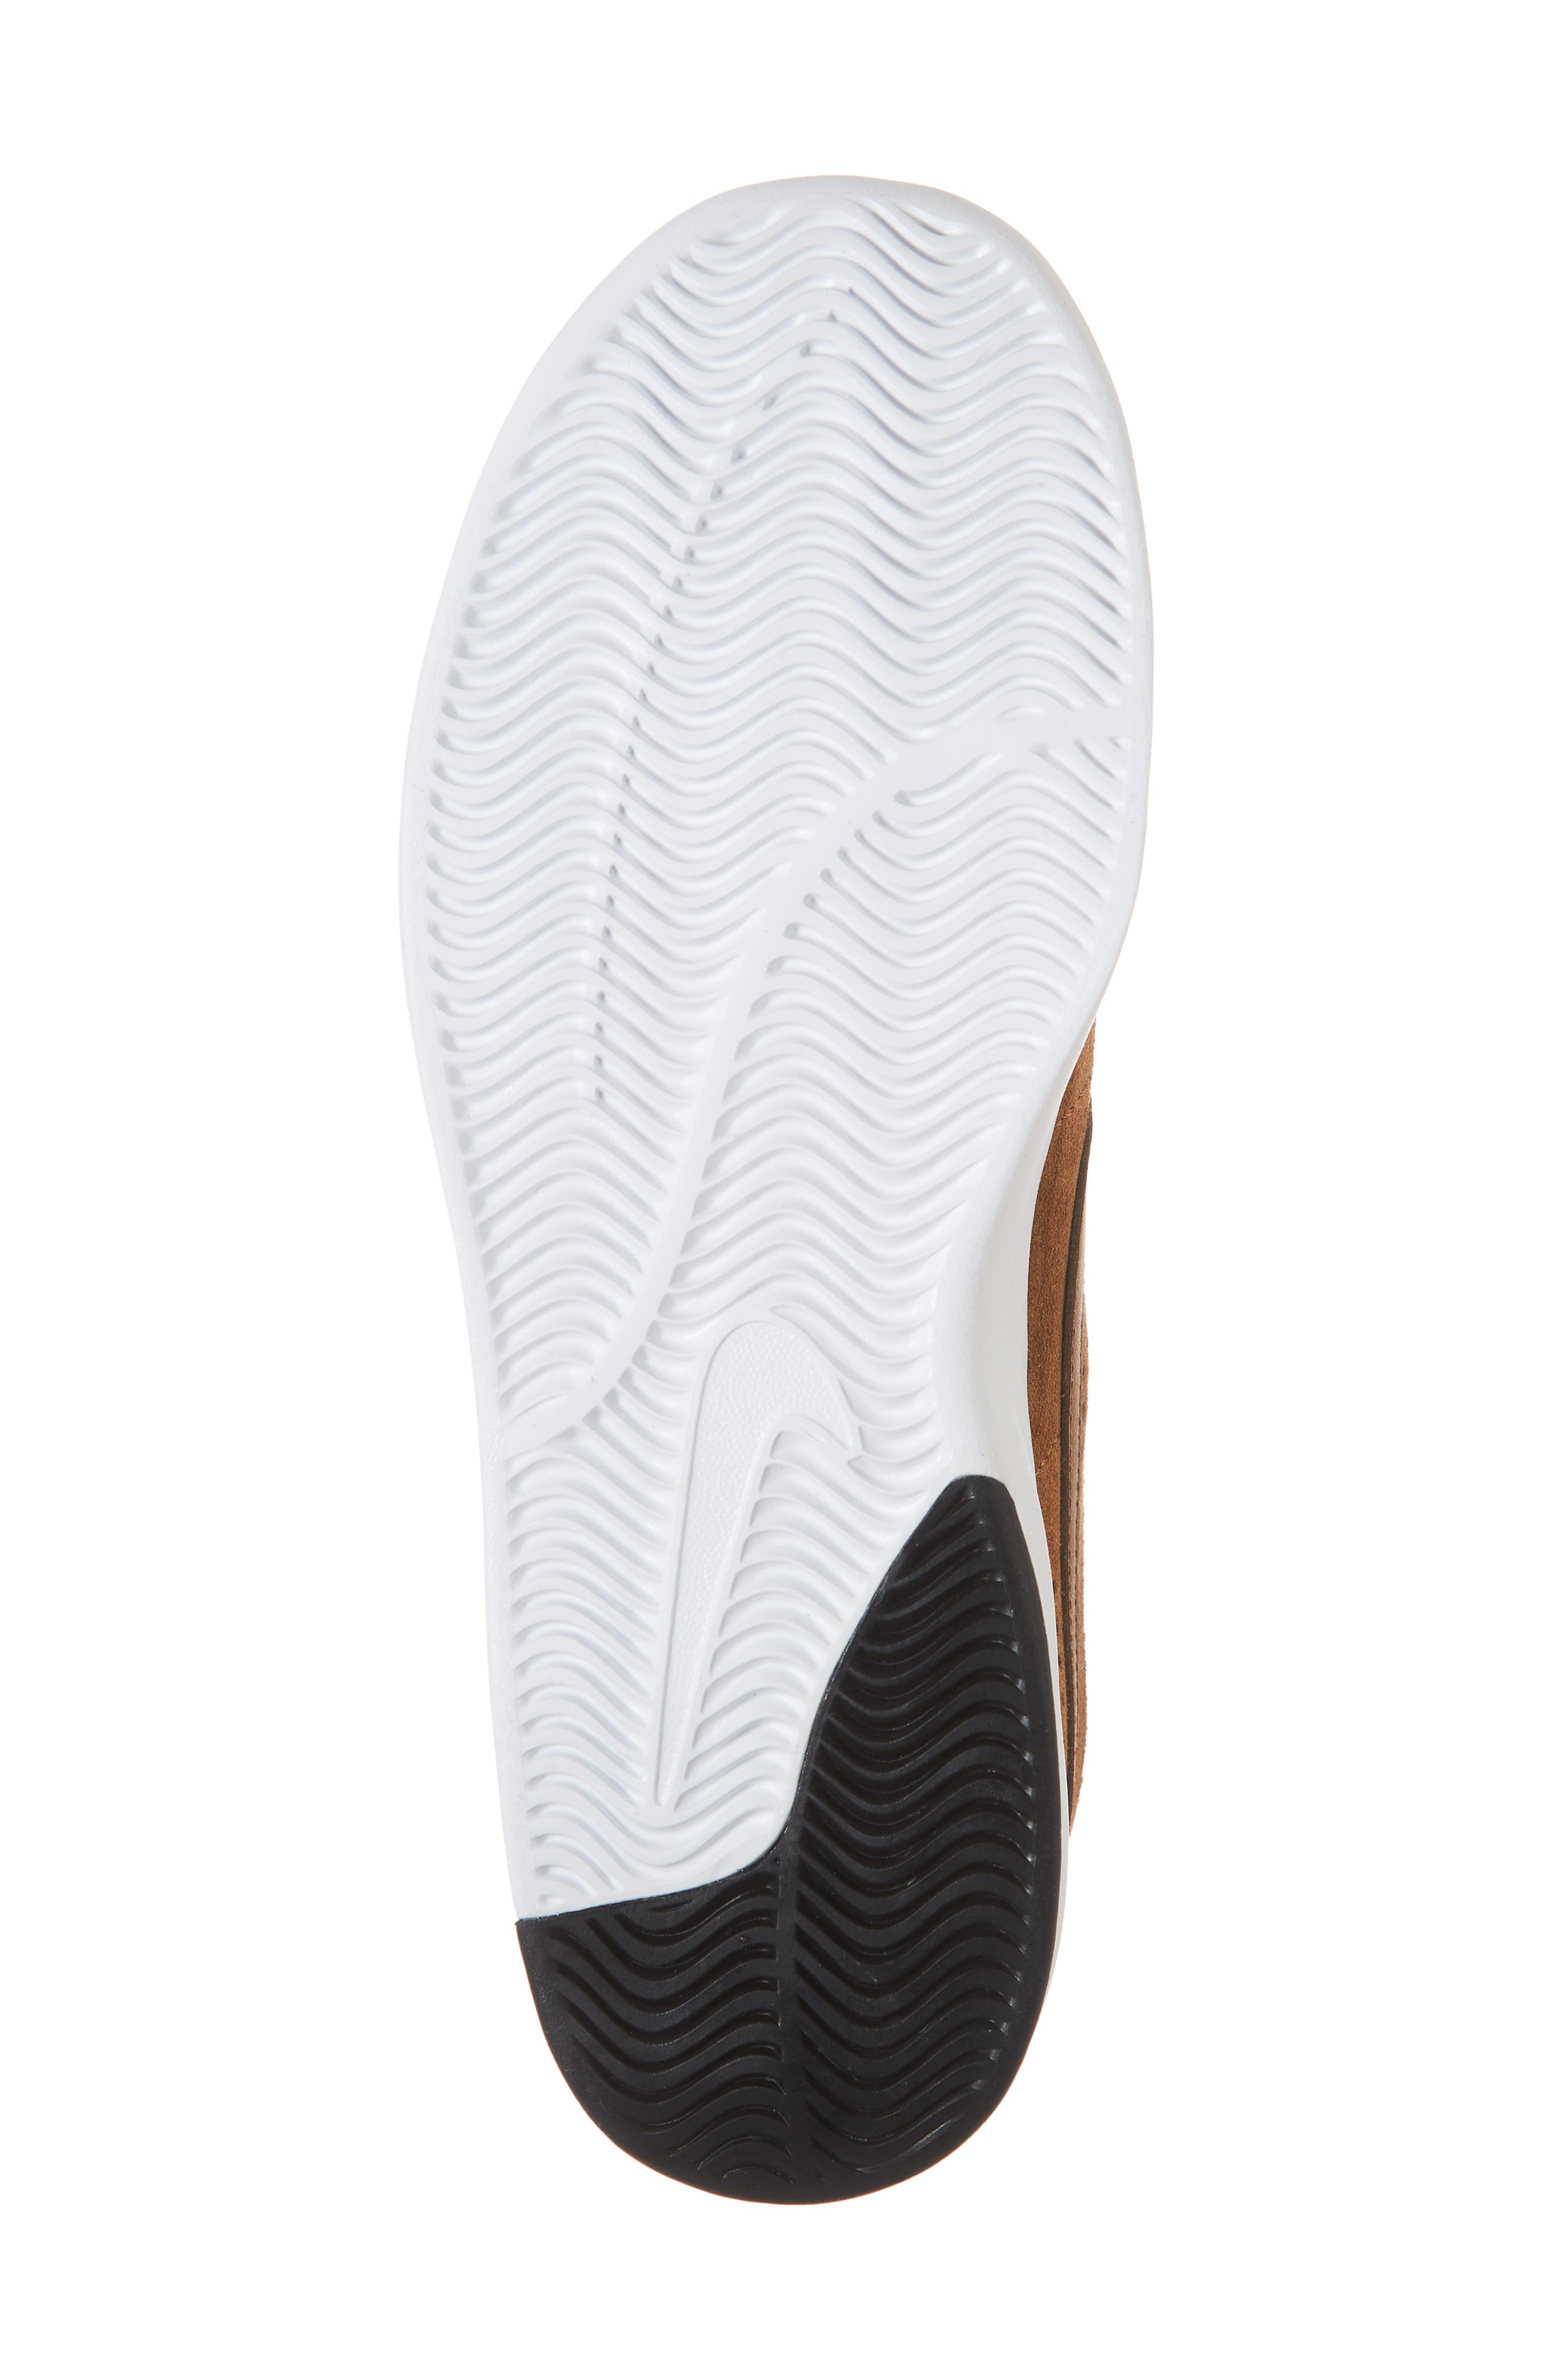 SB Air Max Bruin Vapor Skateboarding Sneaker,                             Alternate thumbnail 6, color,                             BRITISH TAN/ BLACK/ MONARCH